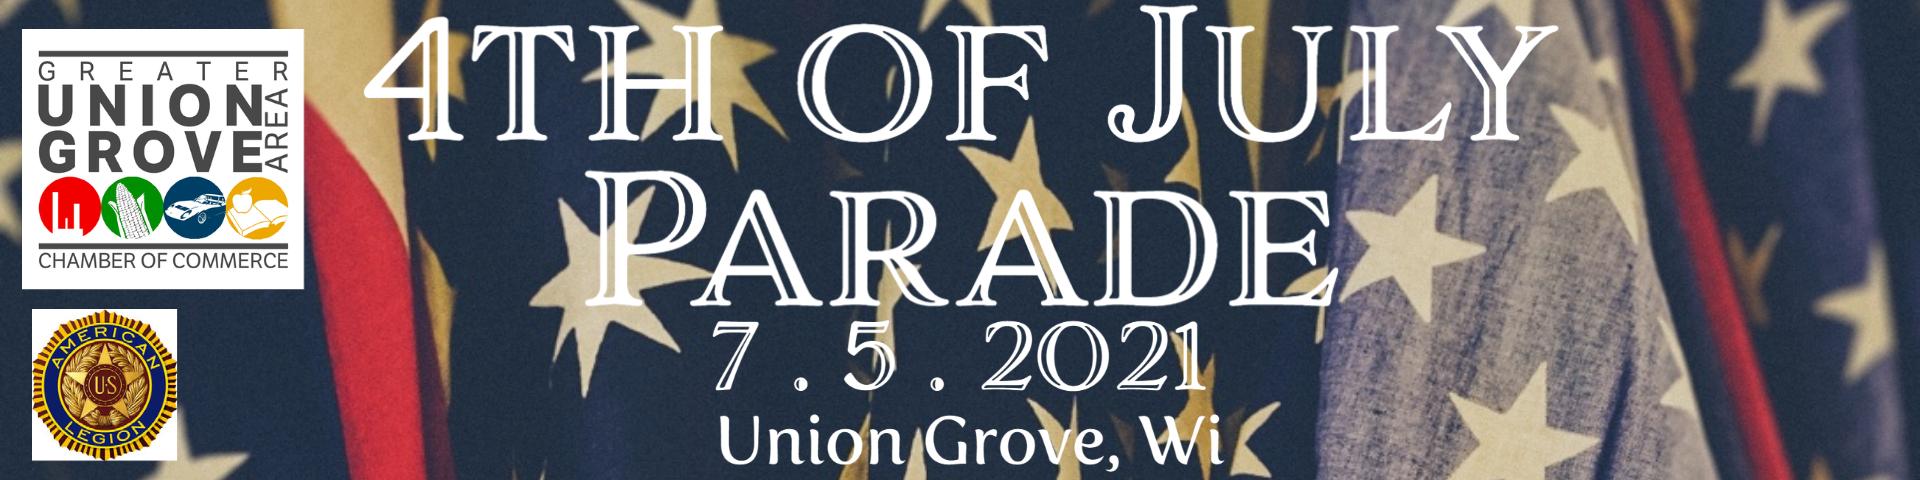 2021-4th-5-of-july-Parade-(2).jpg